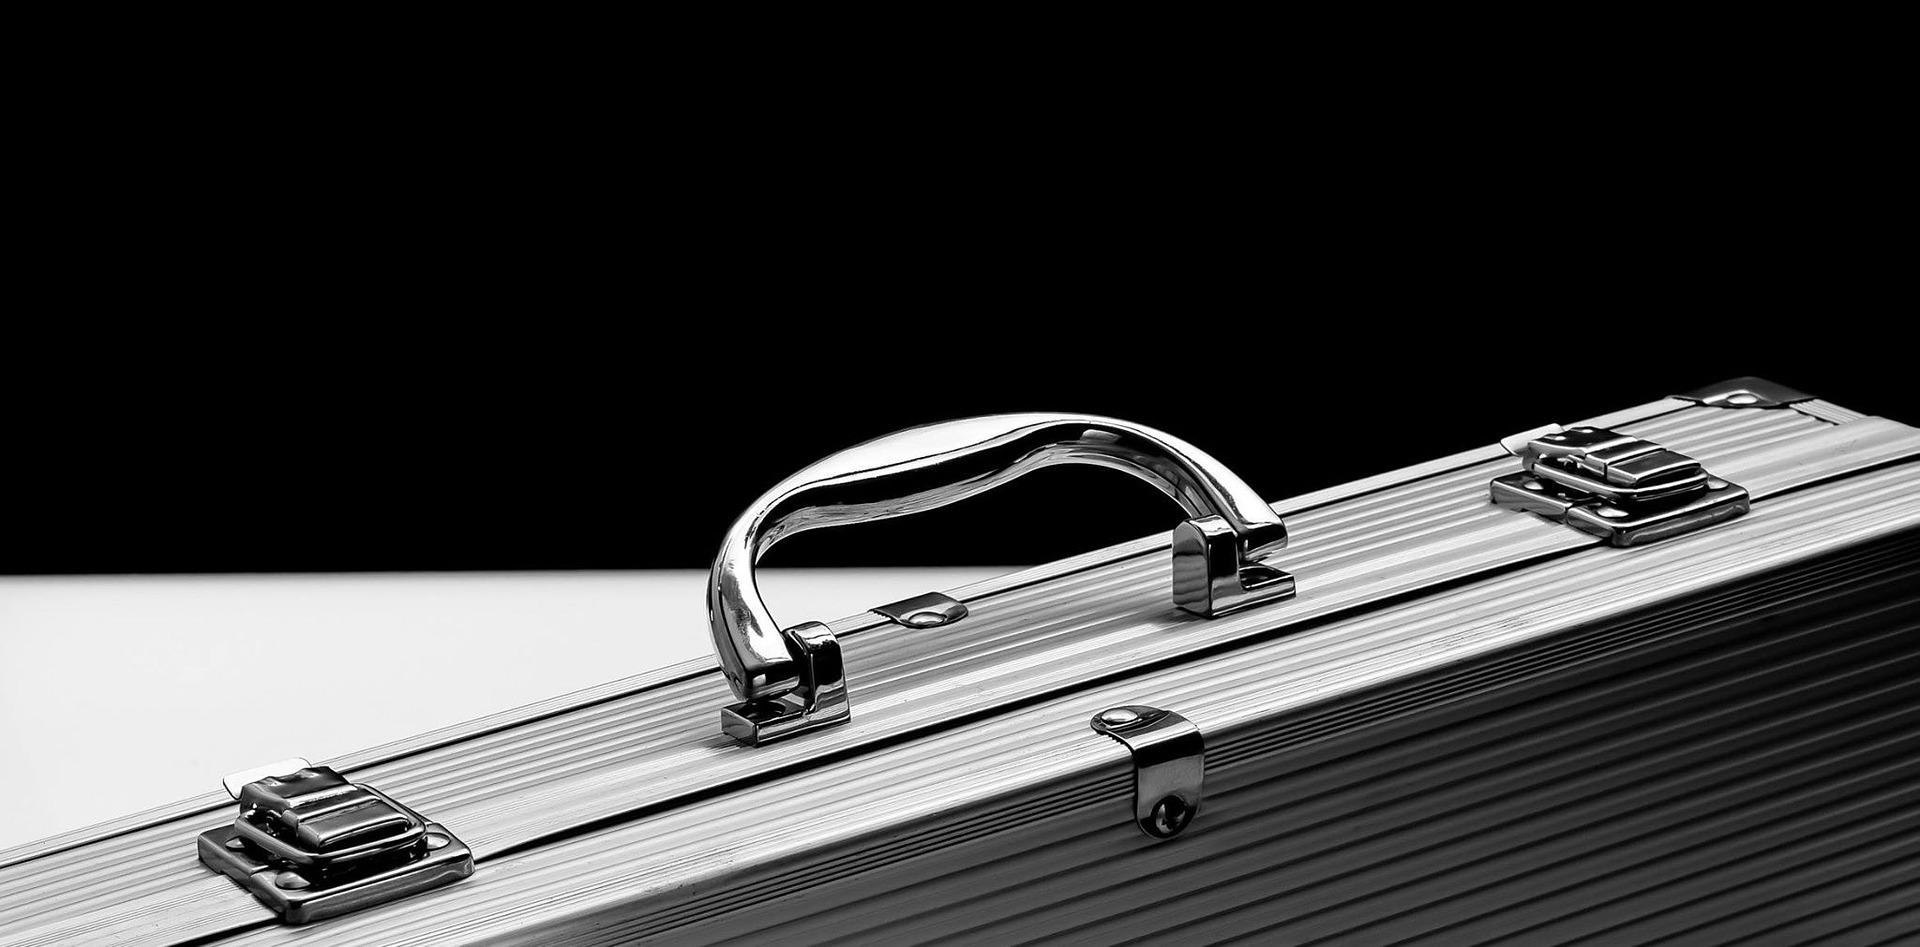 Silver Briefcase against black background